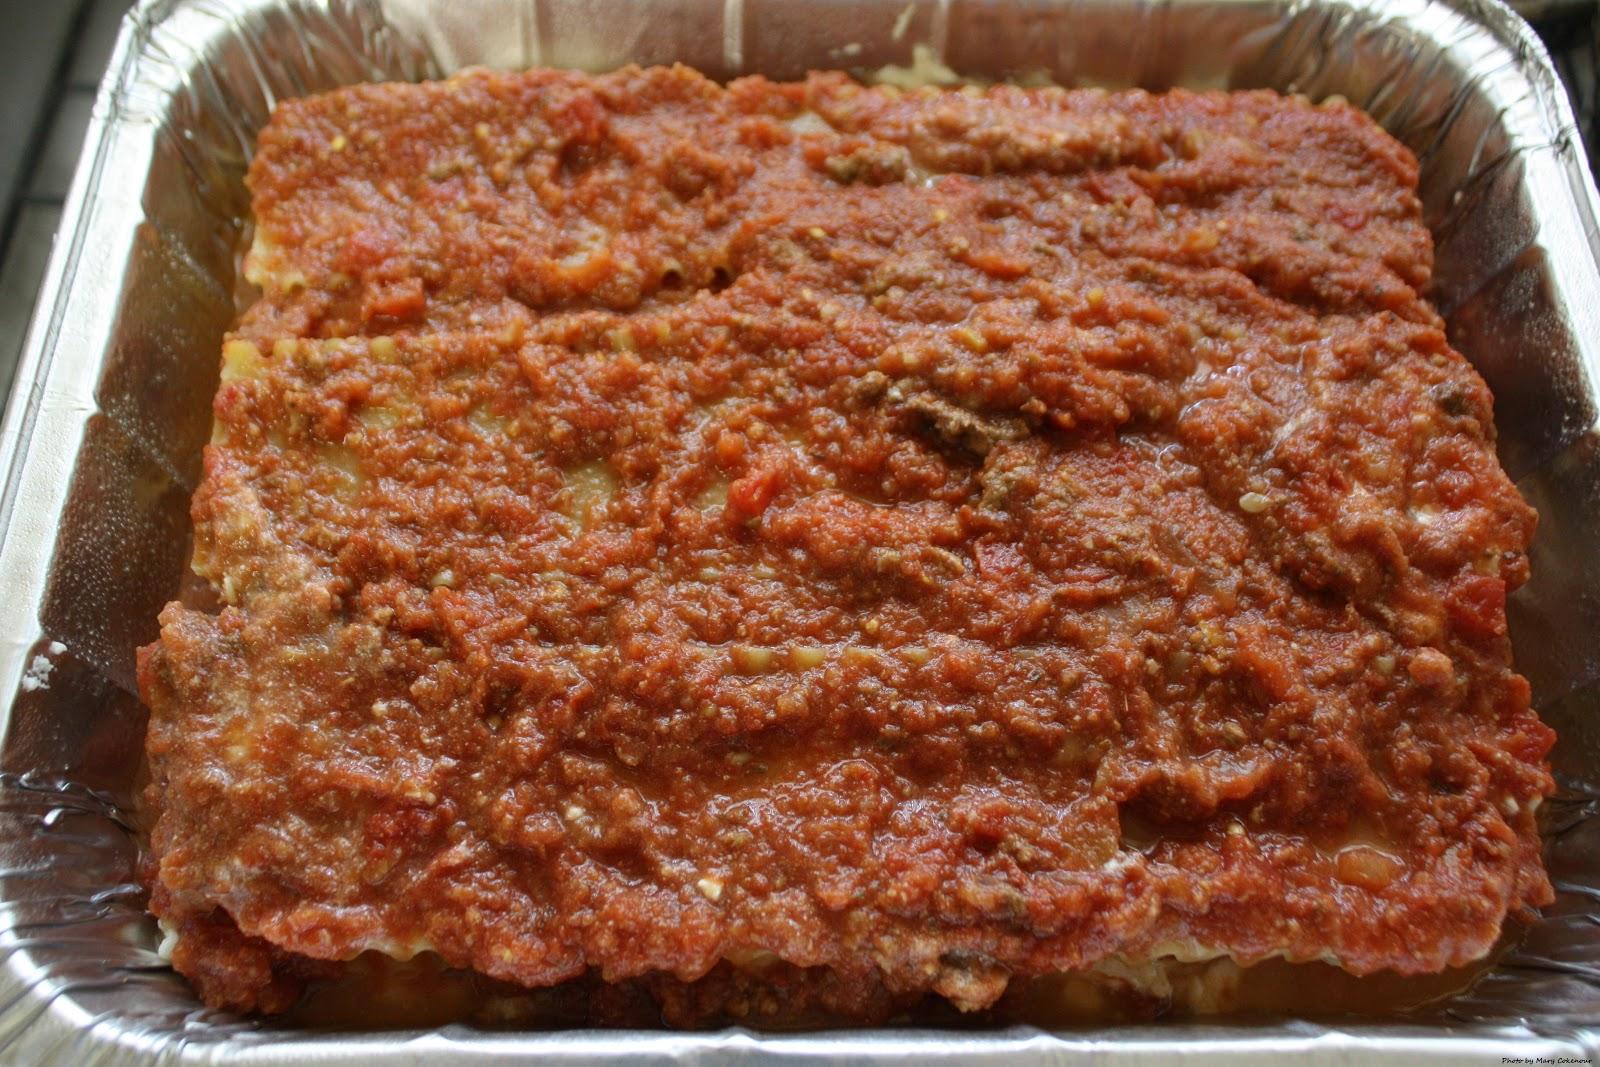 food adventures of a comfort cook: lasagna 101 and no cook